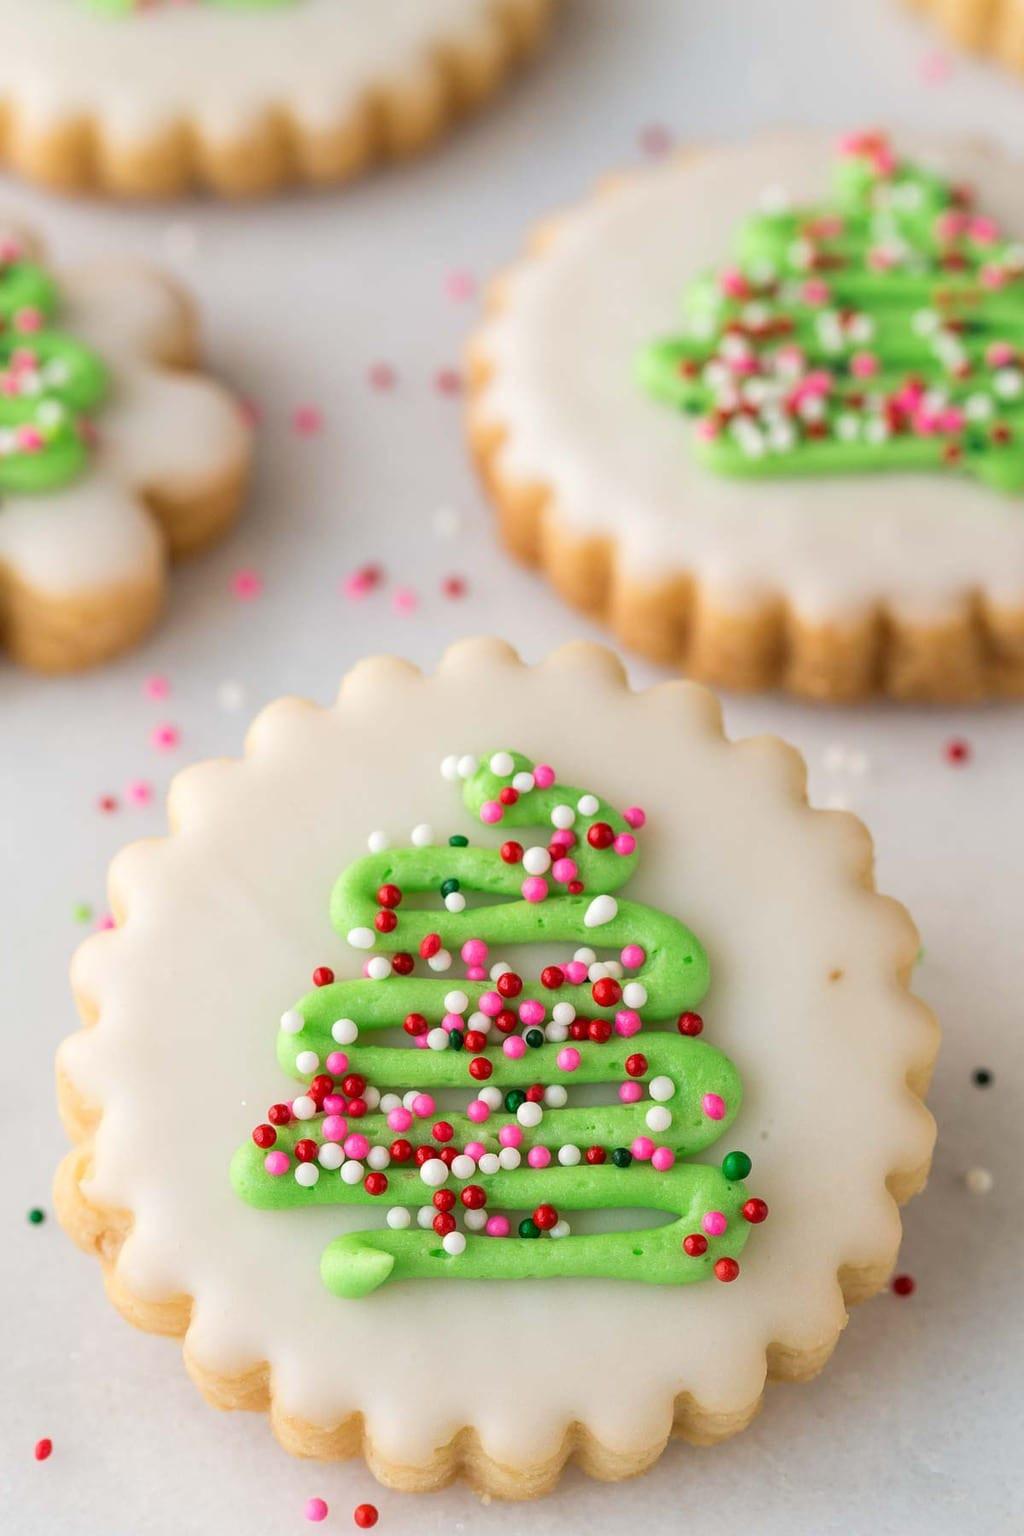 Shortbread Christmas Cookies Recipes  Christmas Shortbread Cookies